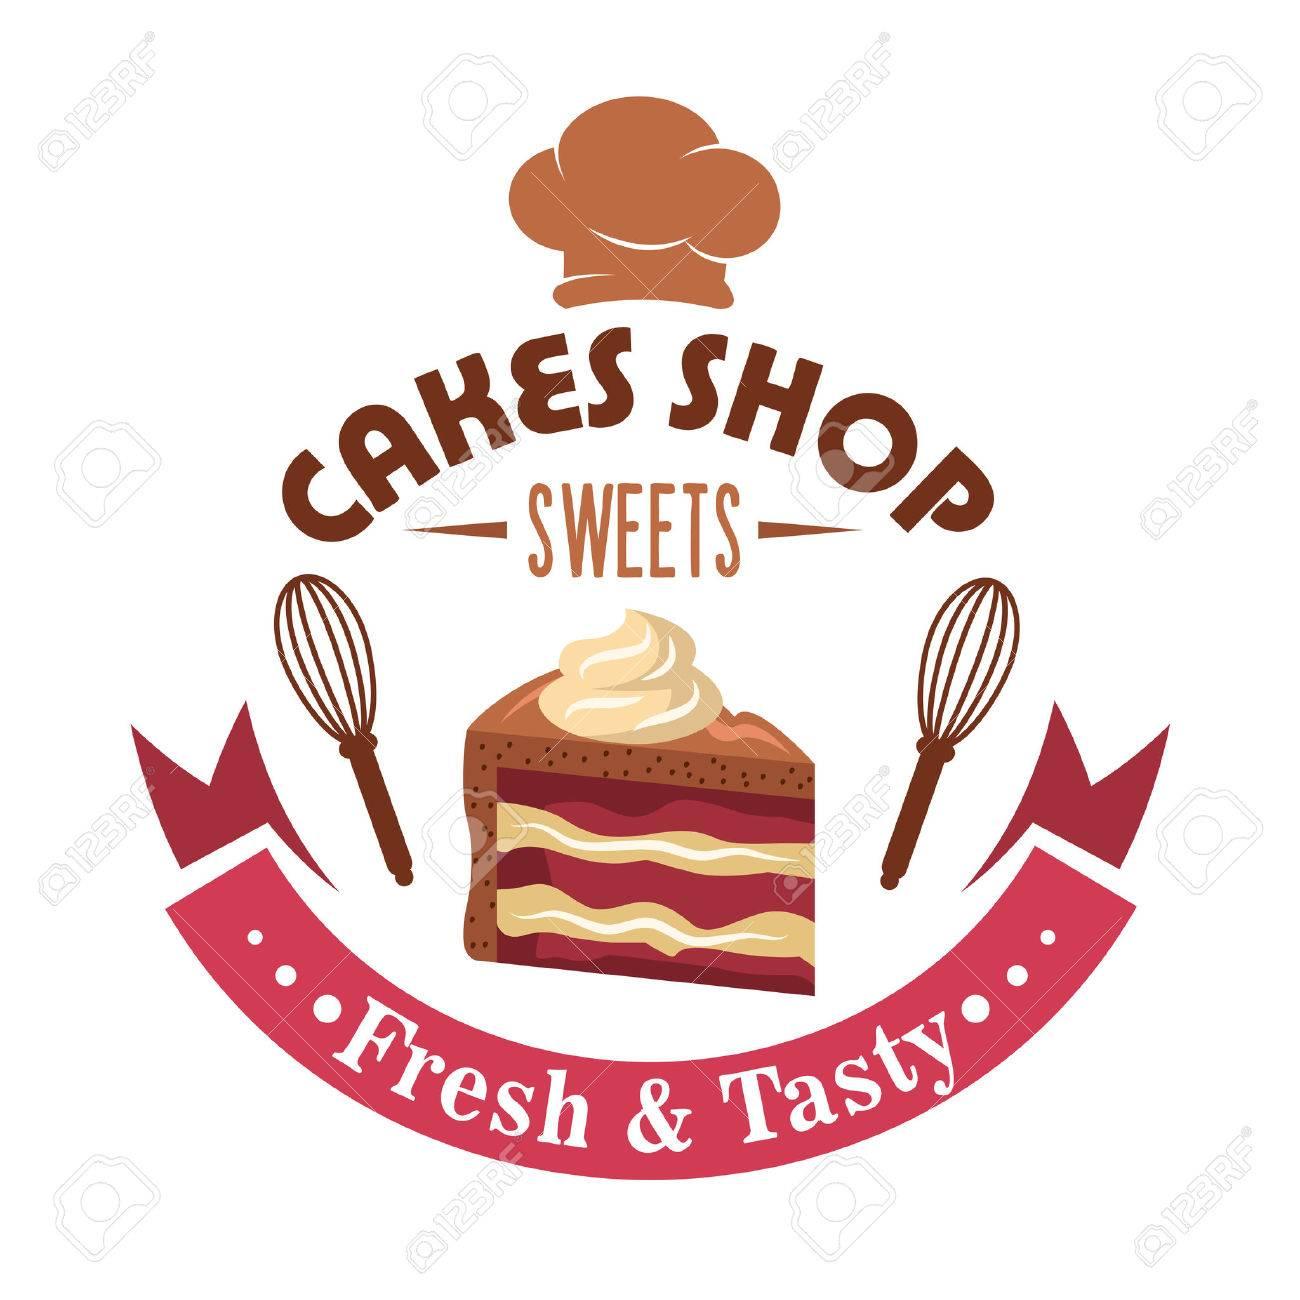 Cake shop retro symbol design with slice of layered strawberry cake shop retro symbol design with slice of layered strawberry cake with chocolate frosting garnished by buycottarizona